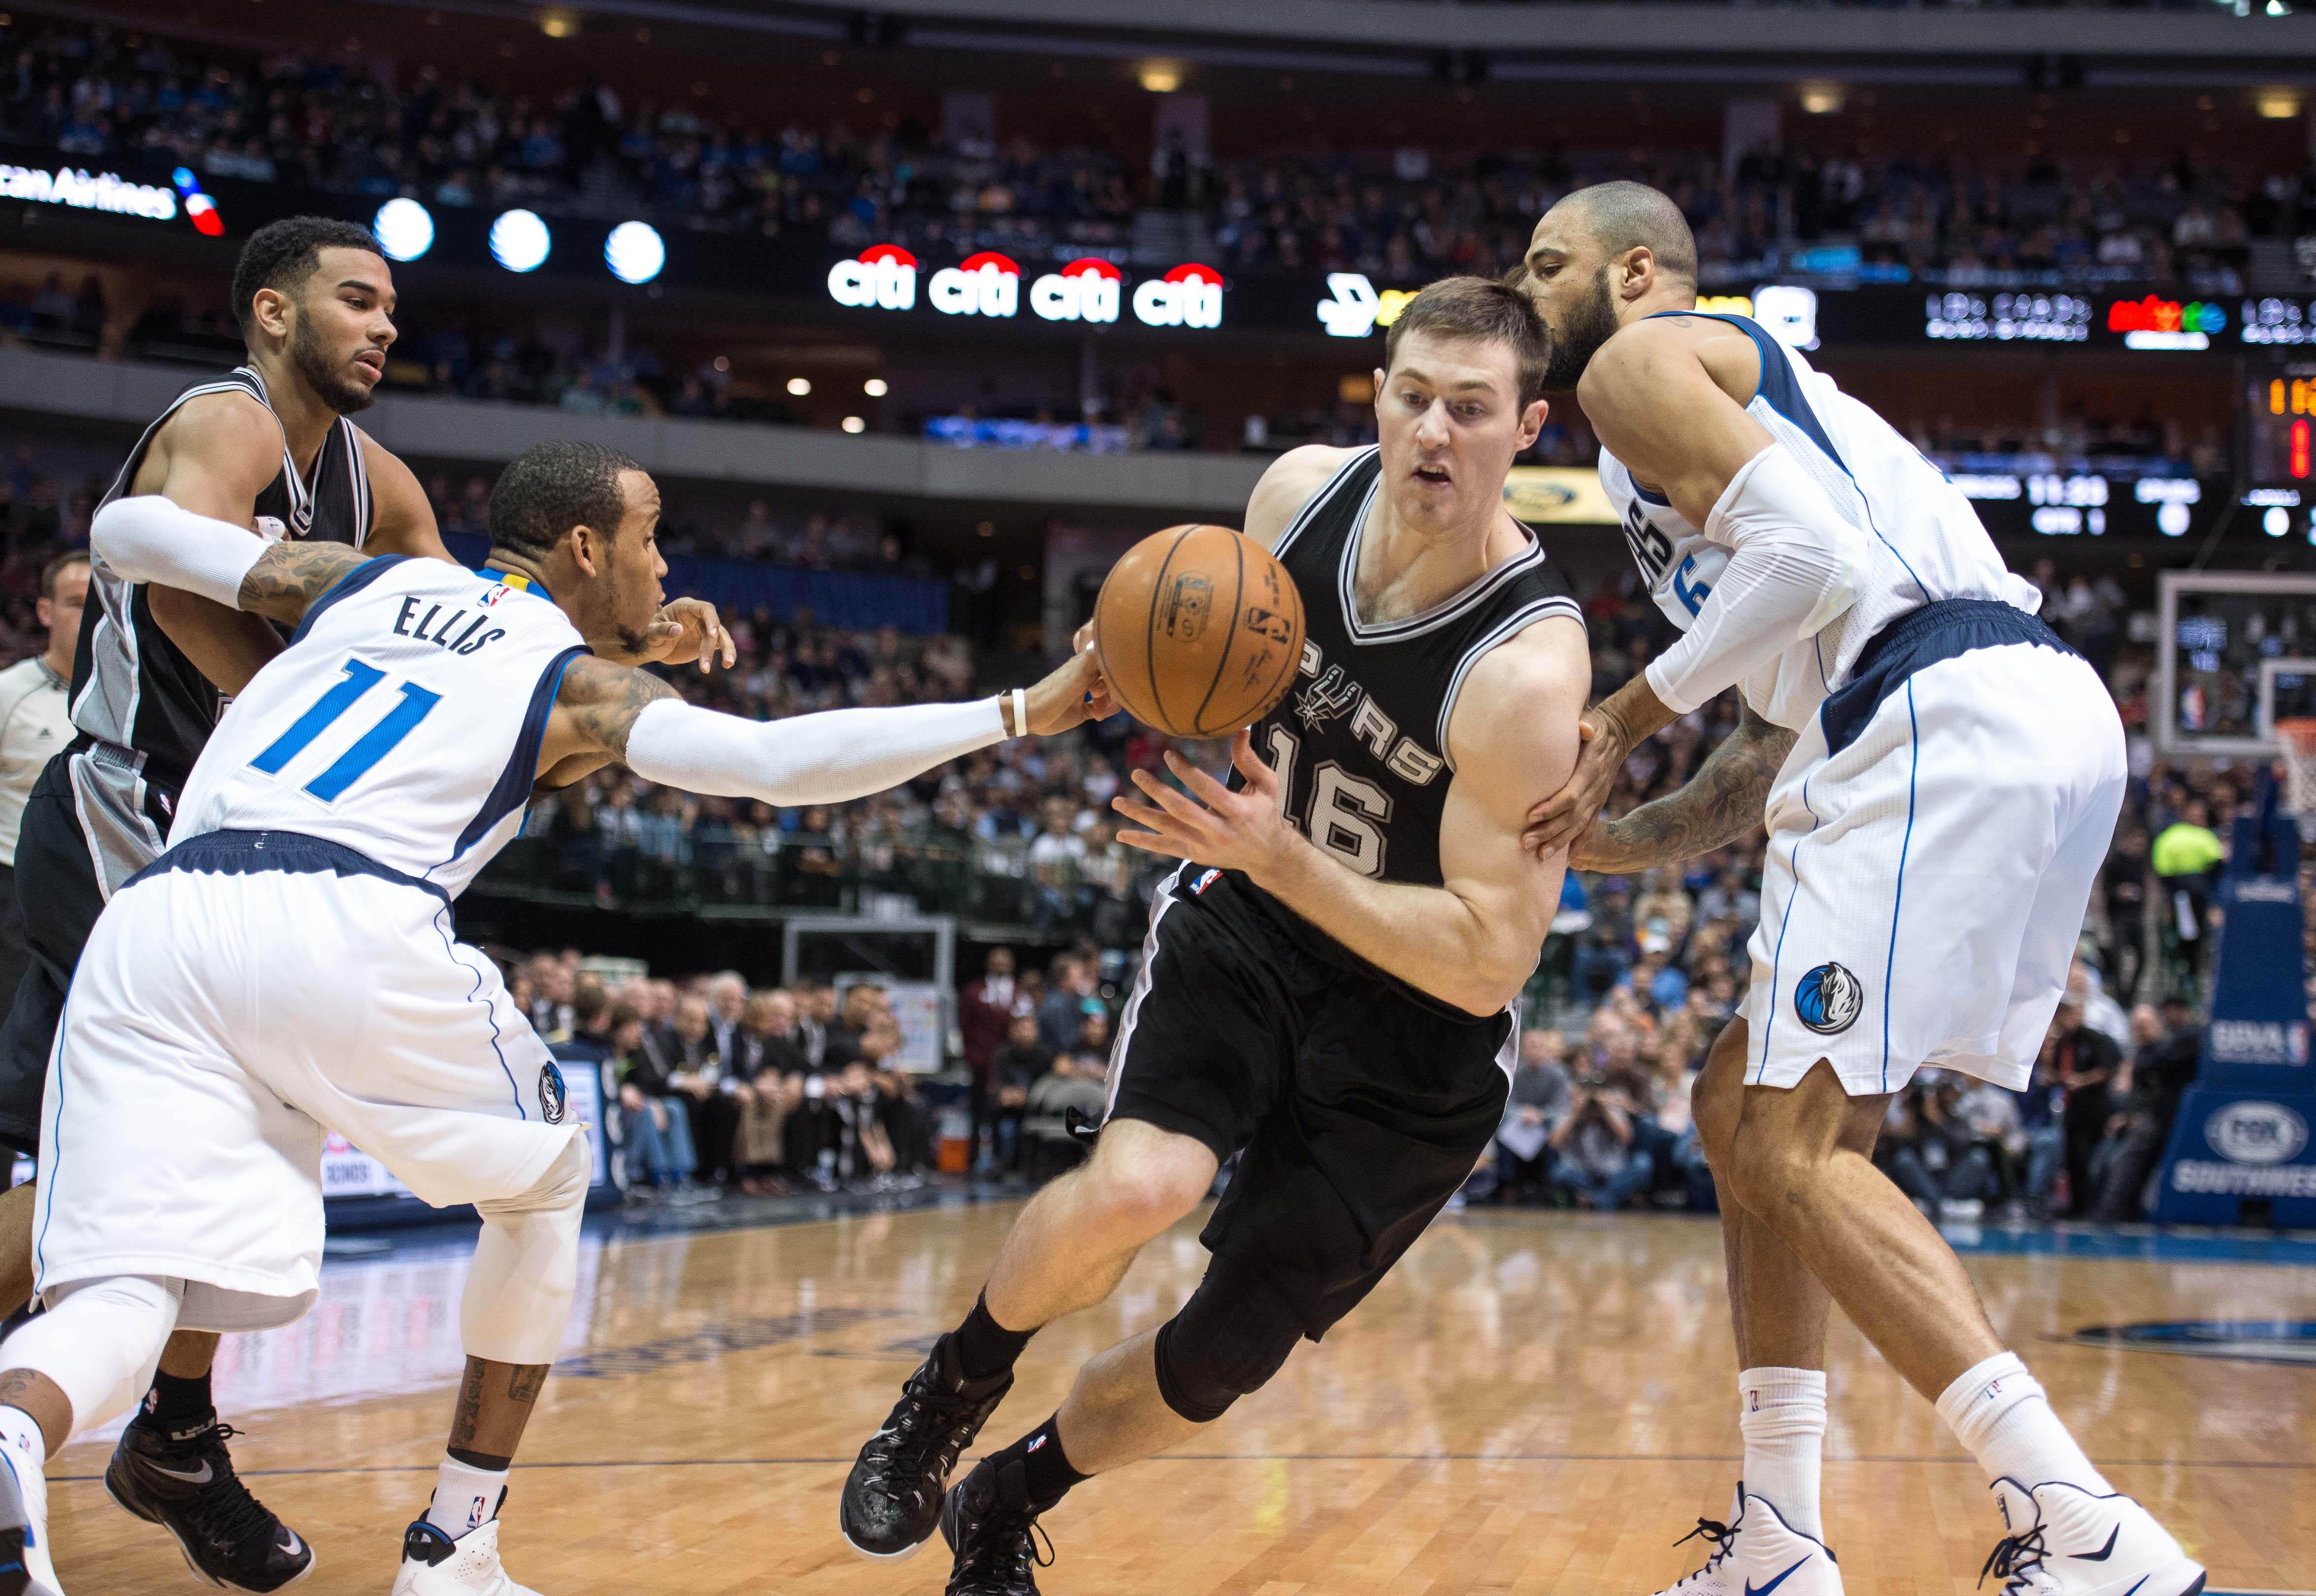 San Antonio Spurs forward Aron Baynes led the Pacific Northwest this weekend.